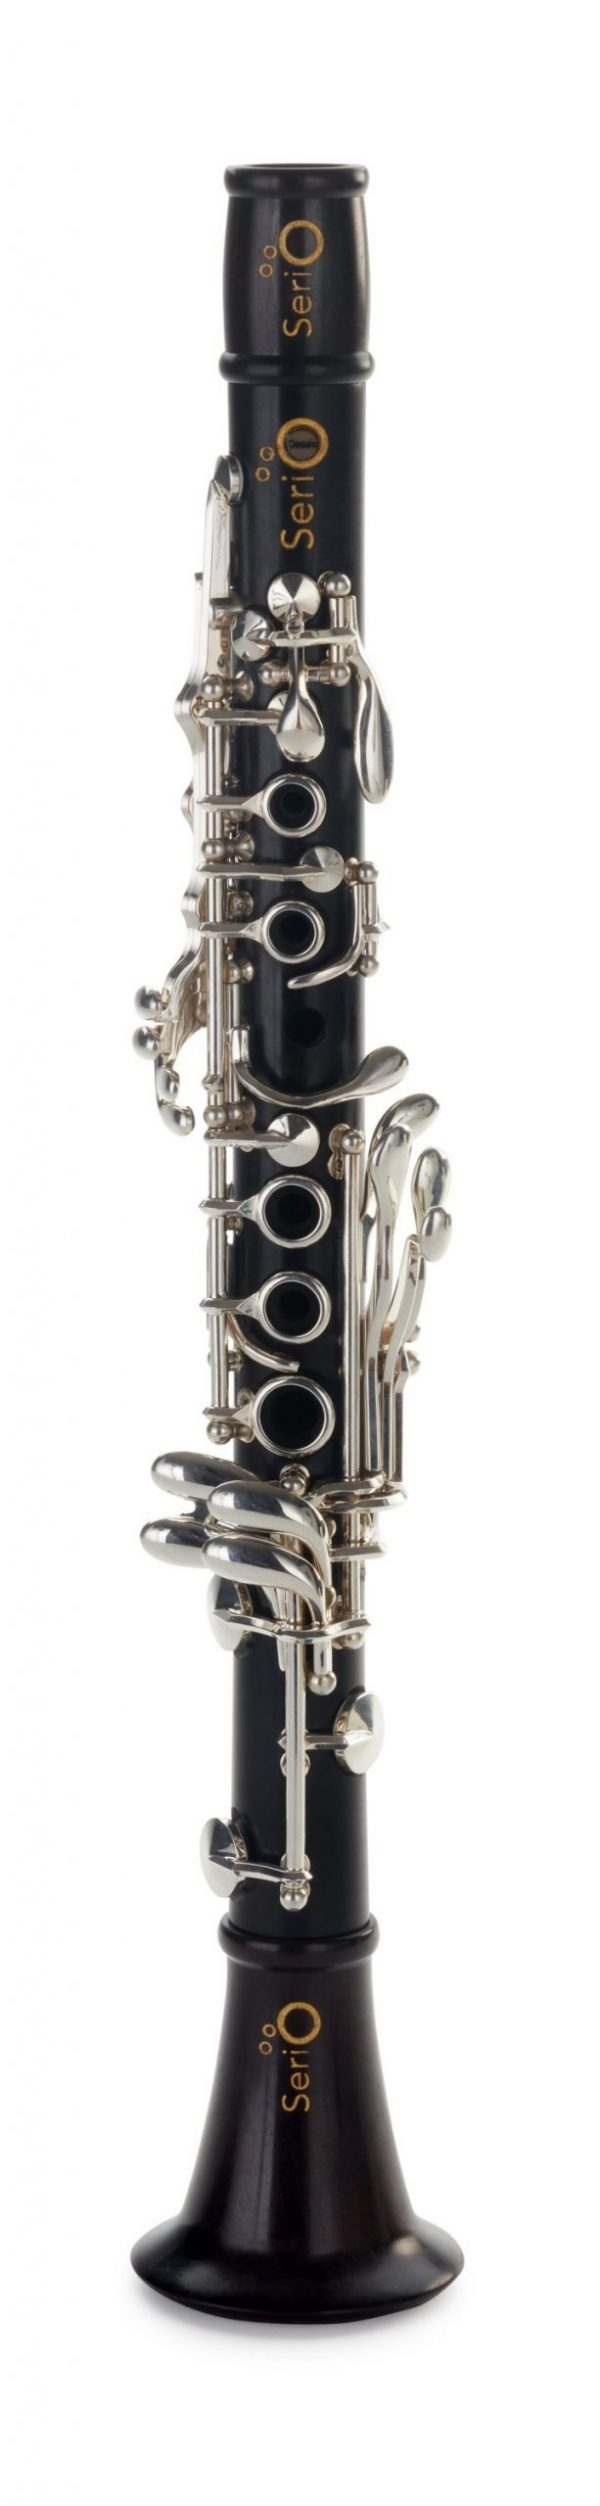 Oscuro Eb clarinet copy cc efd cbc bab aefcbe scaled